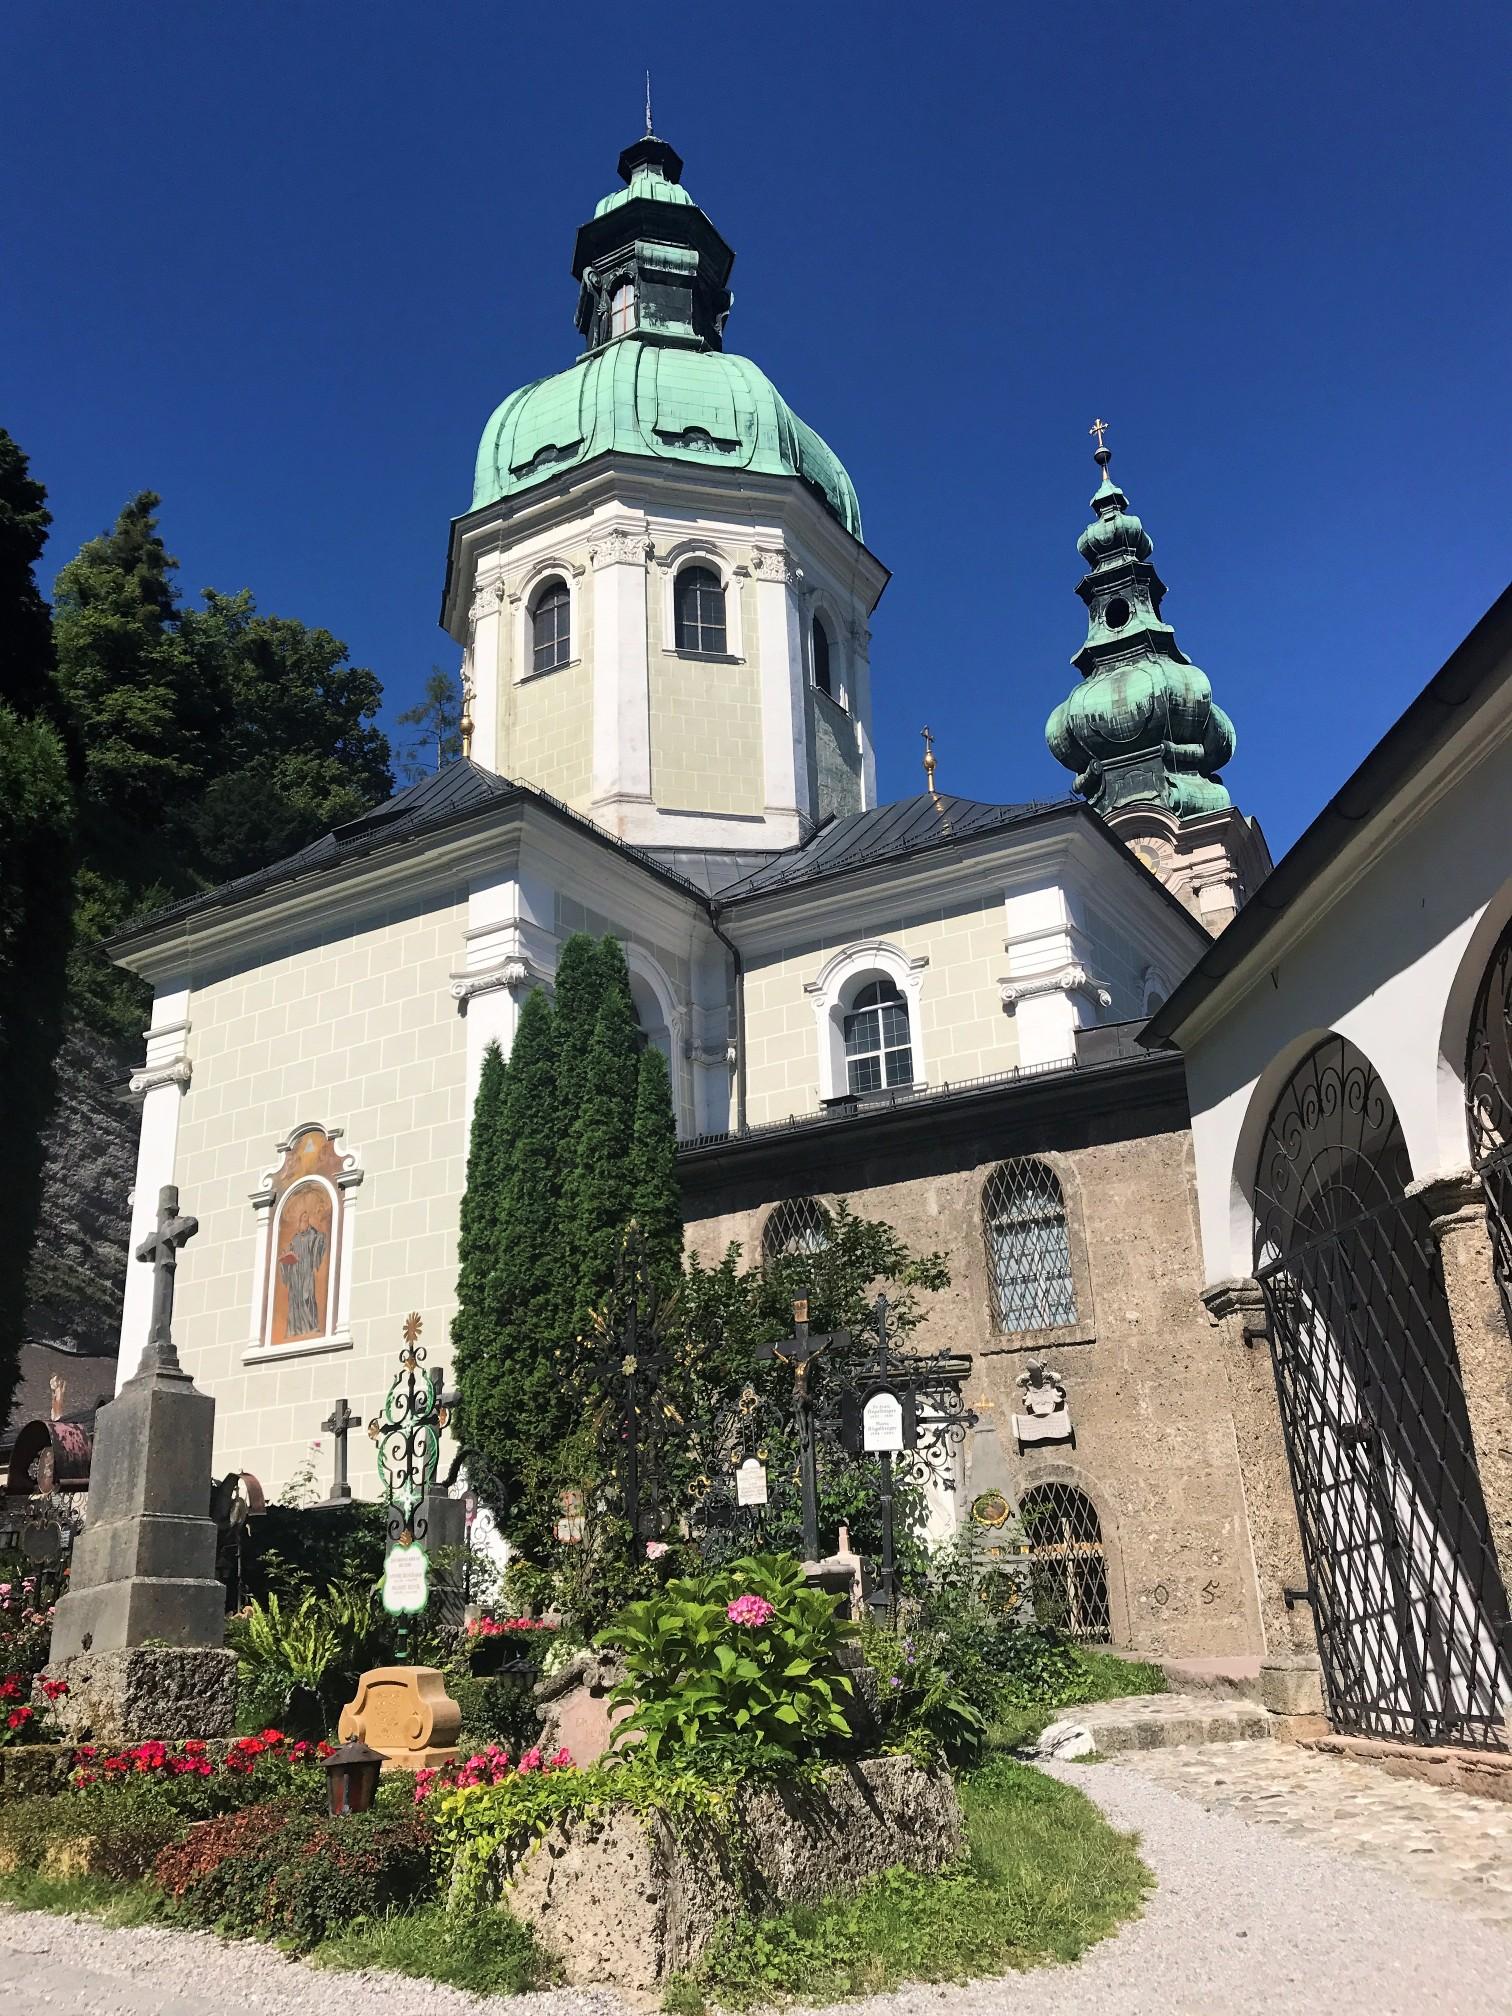 St. Peter's Monastery